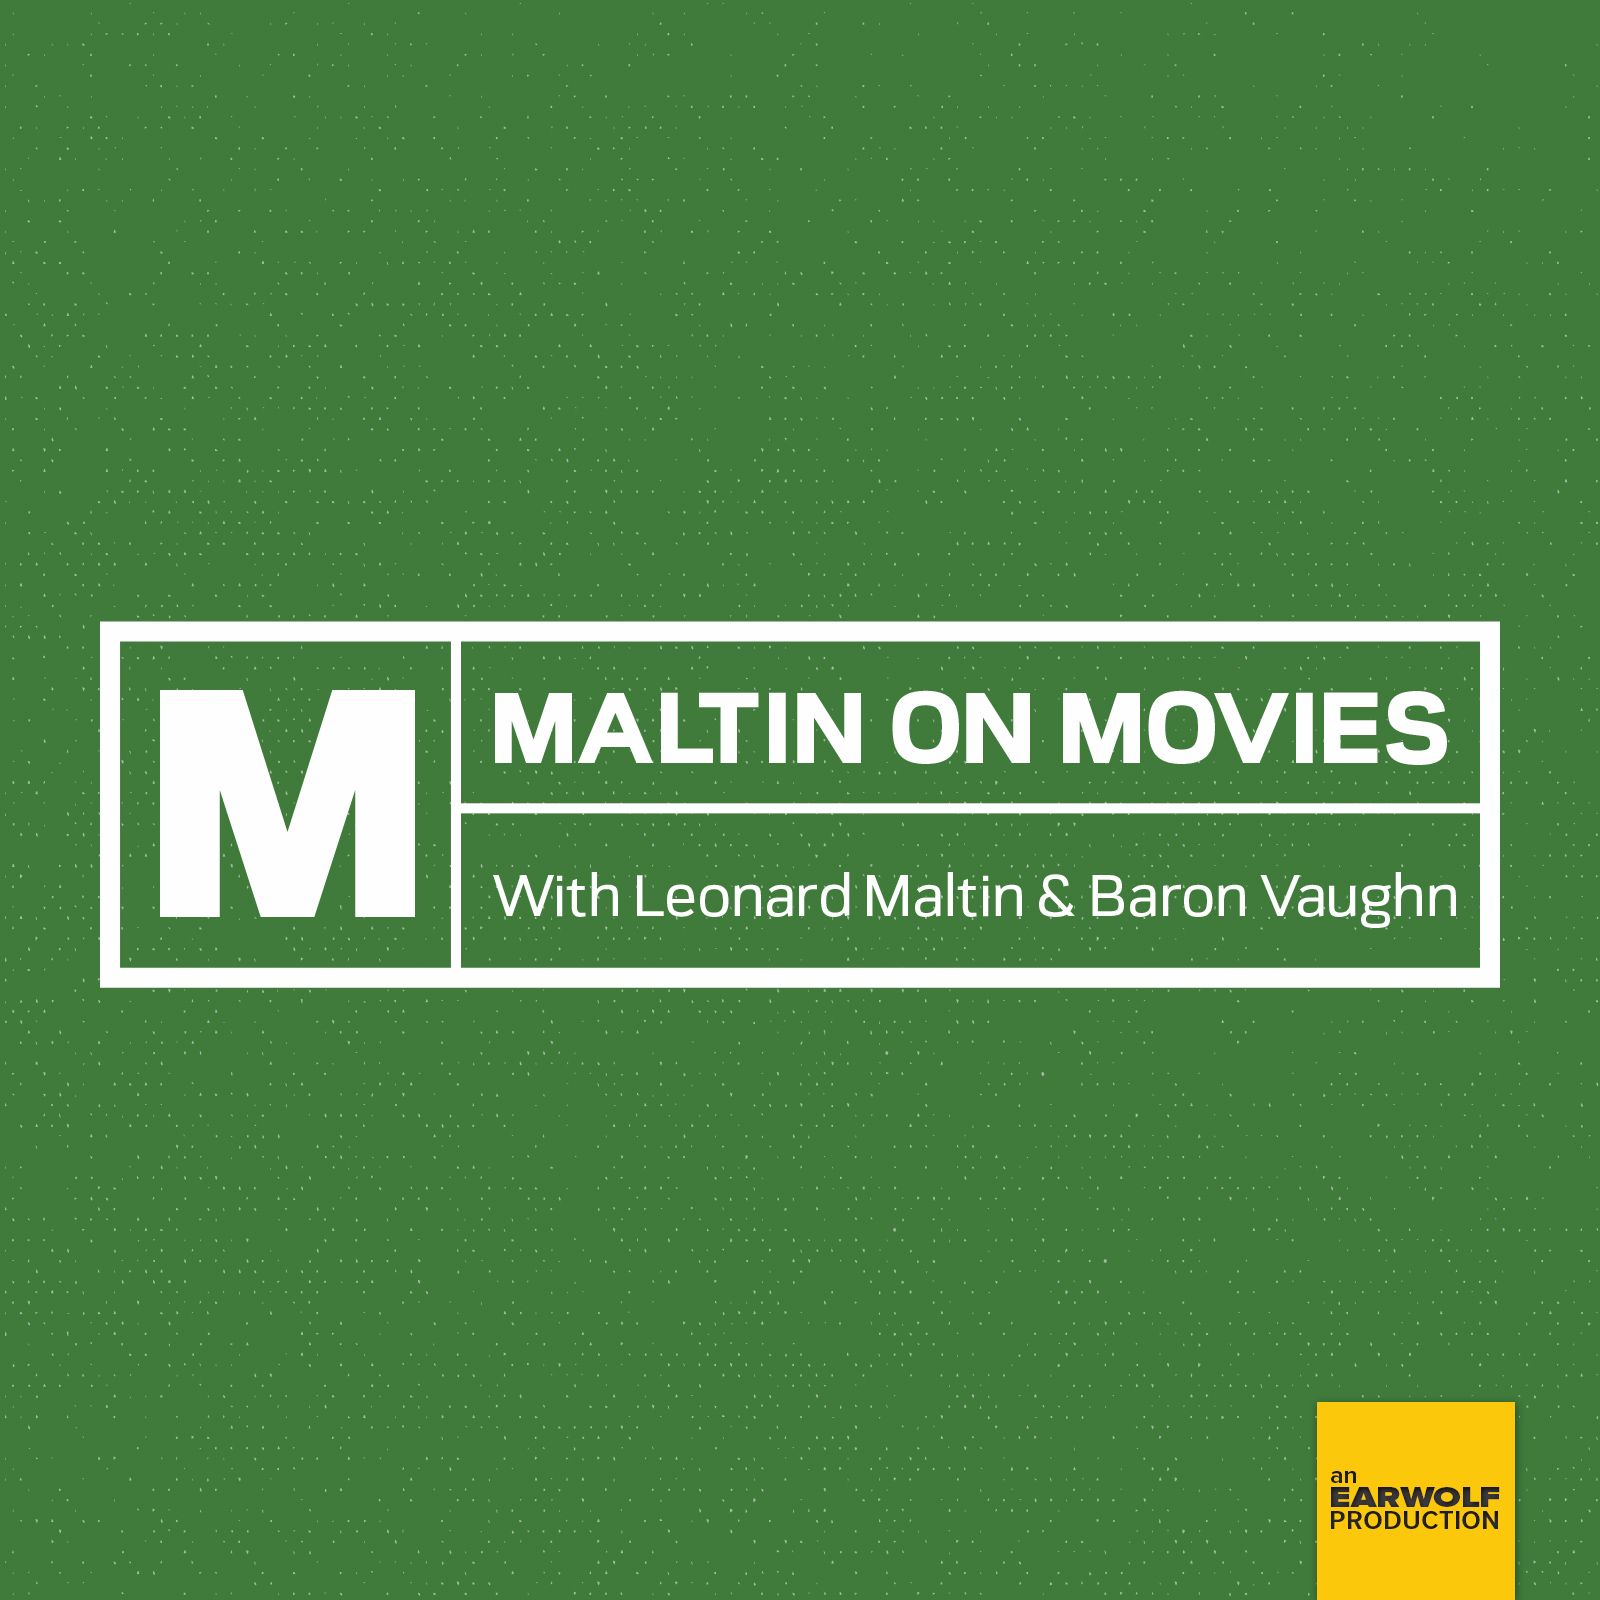 Artwork for 32 Films That Left A Lasting Impression (w/ Jessie Maltin)